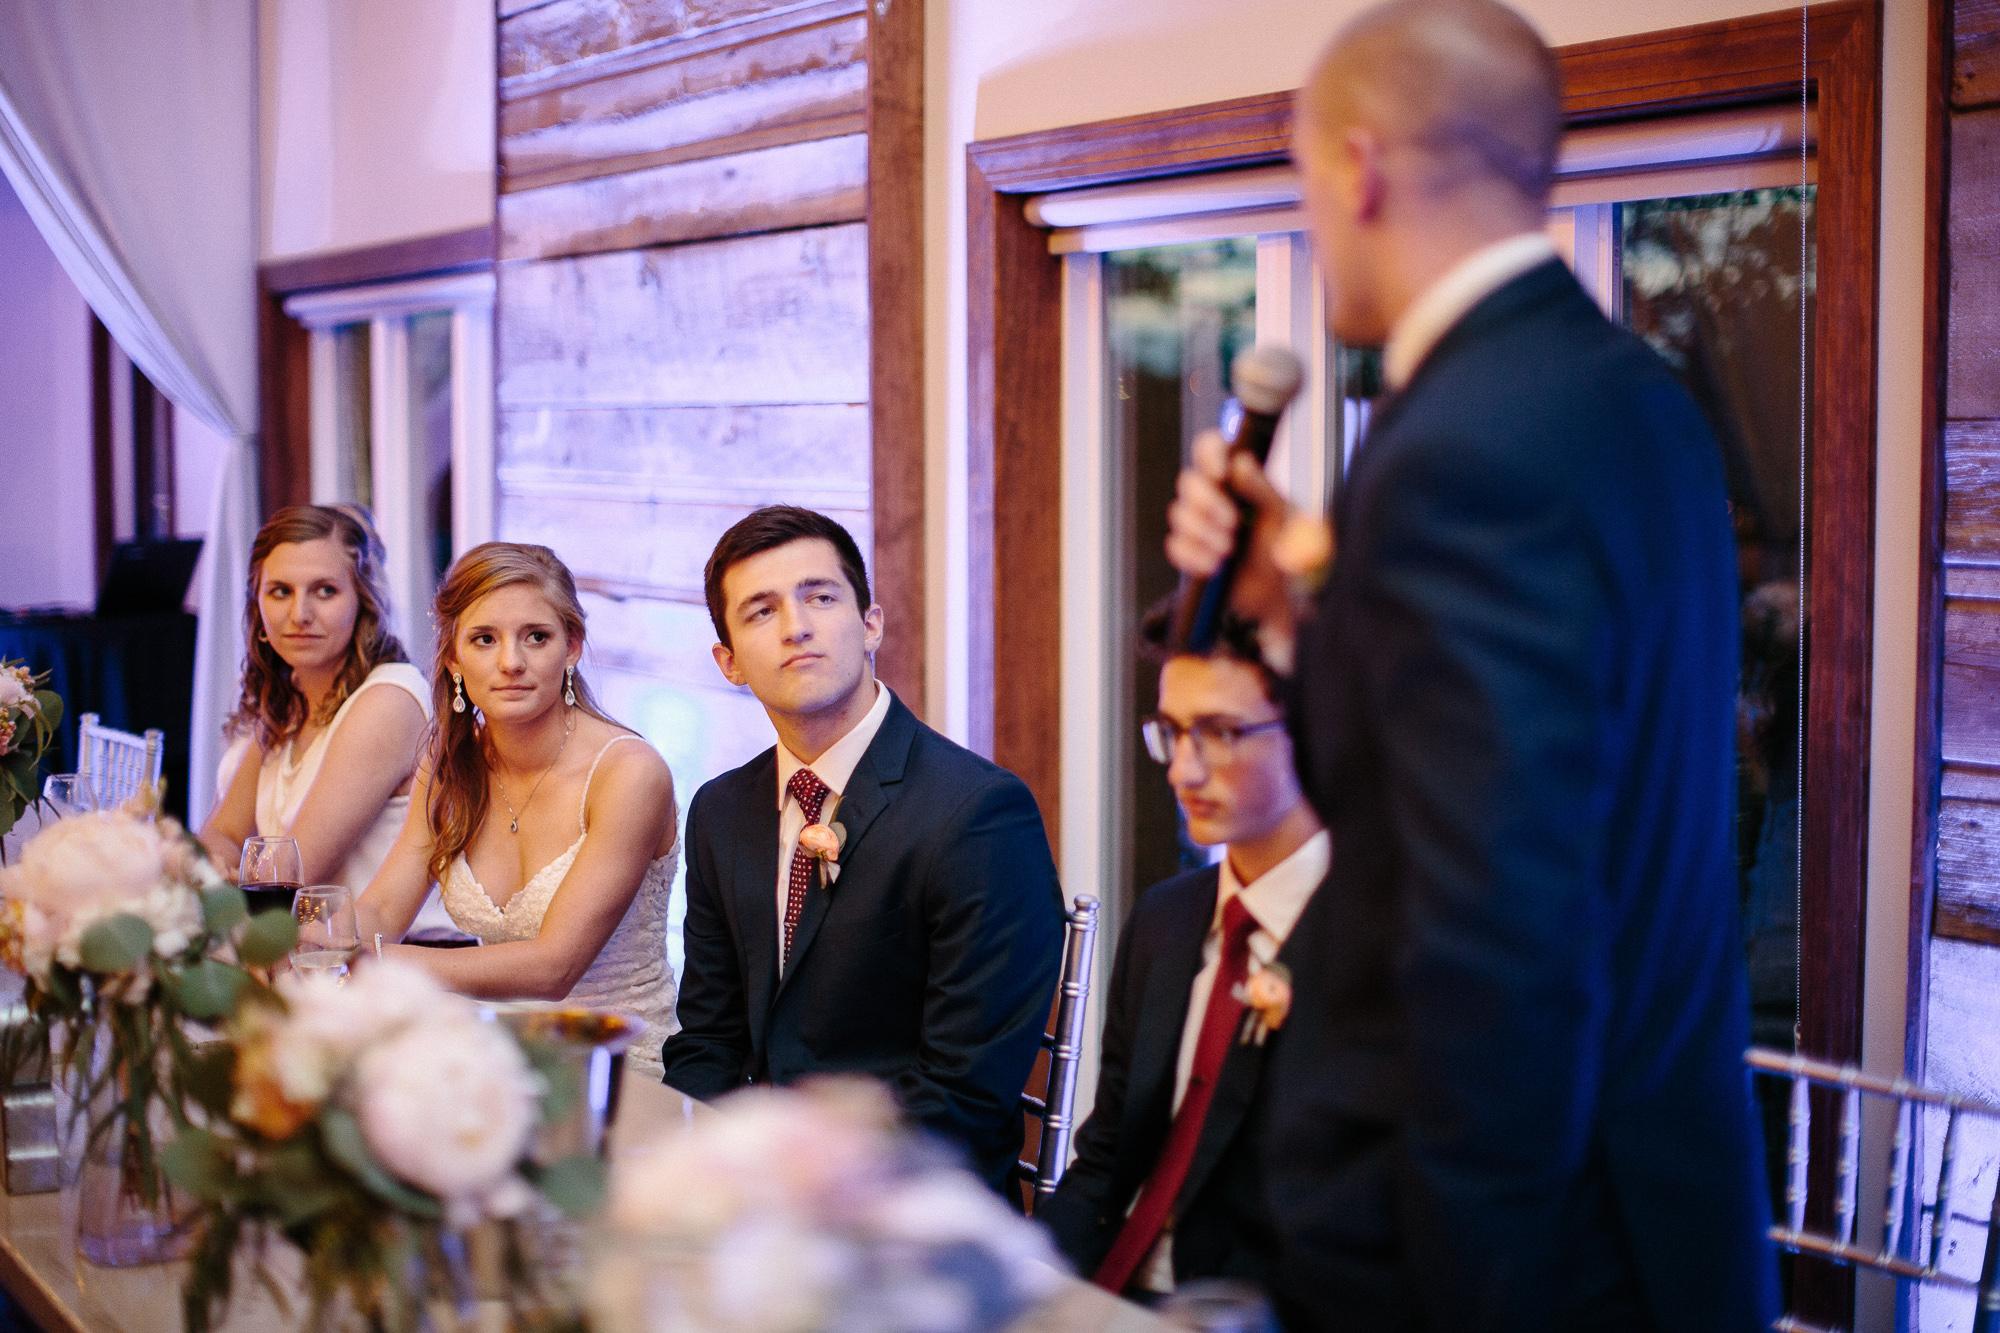 wedding-elopement-adventerous-romantic-timeless-south-dakota-blue-haven-barn-106.jpg